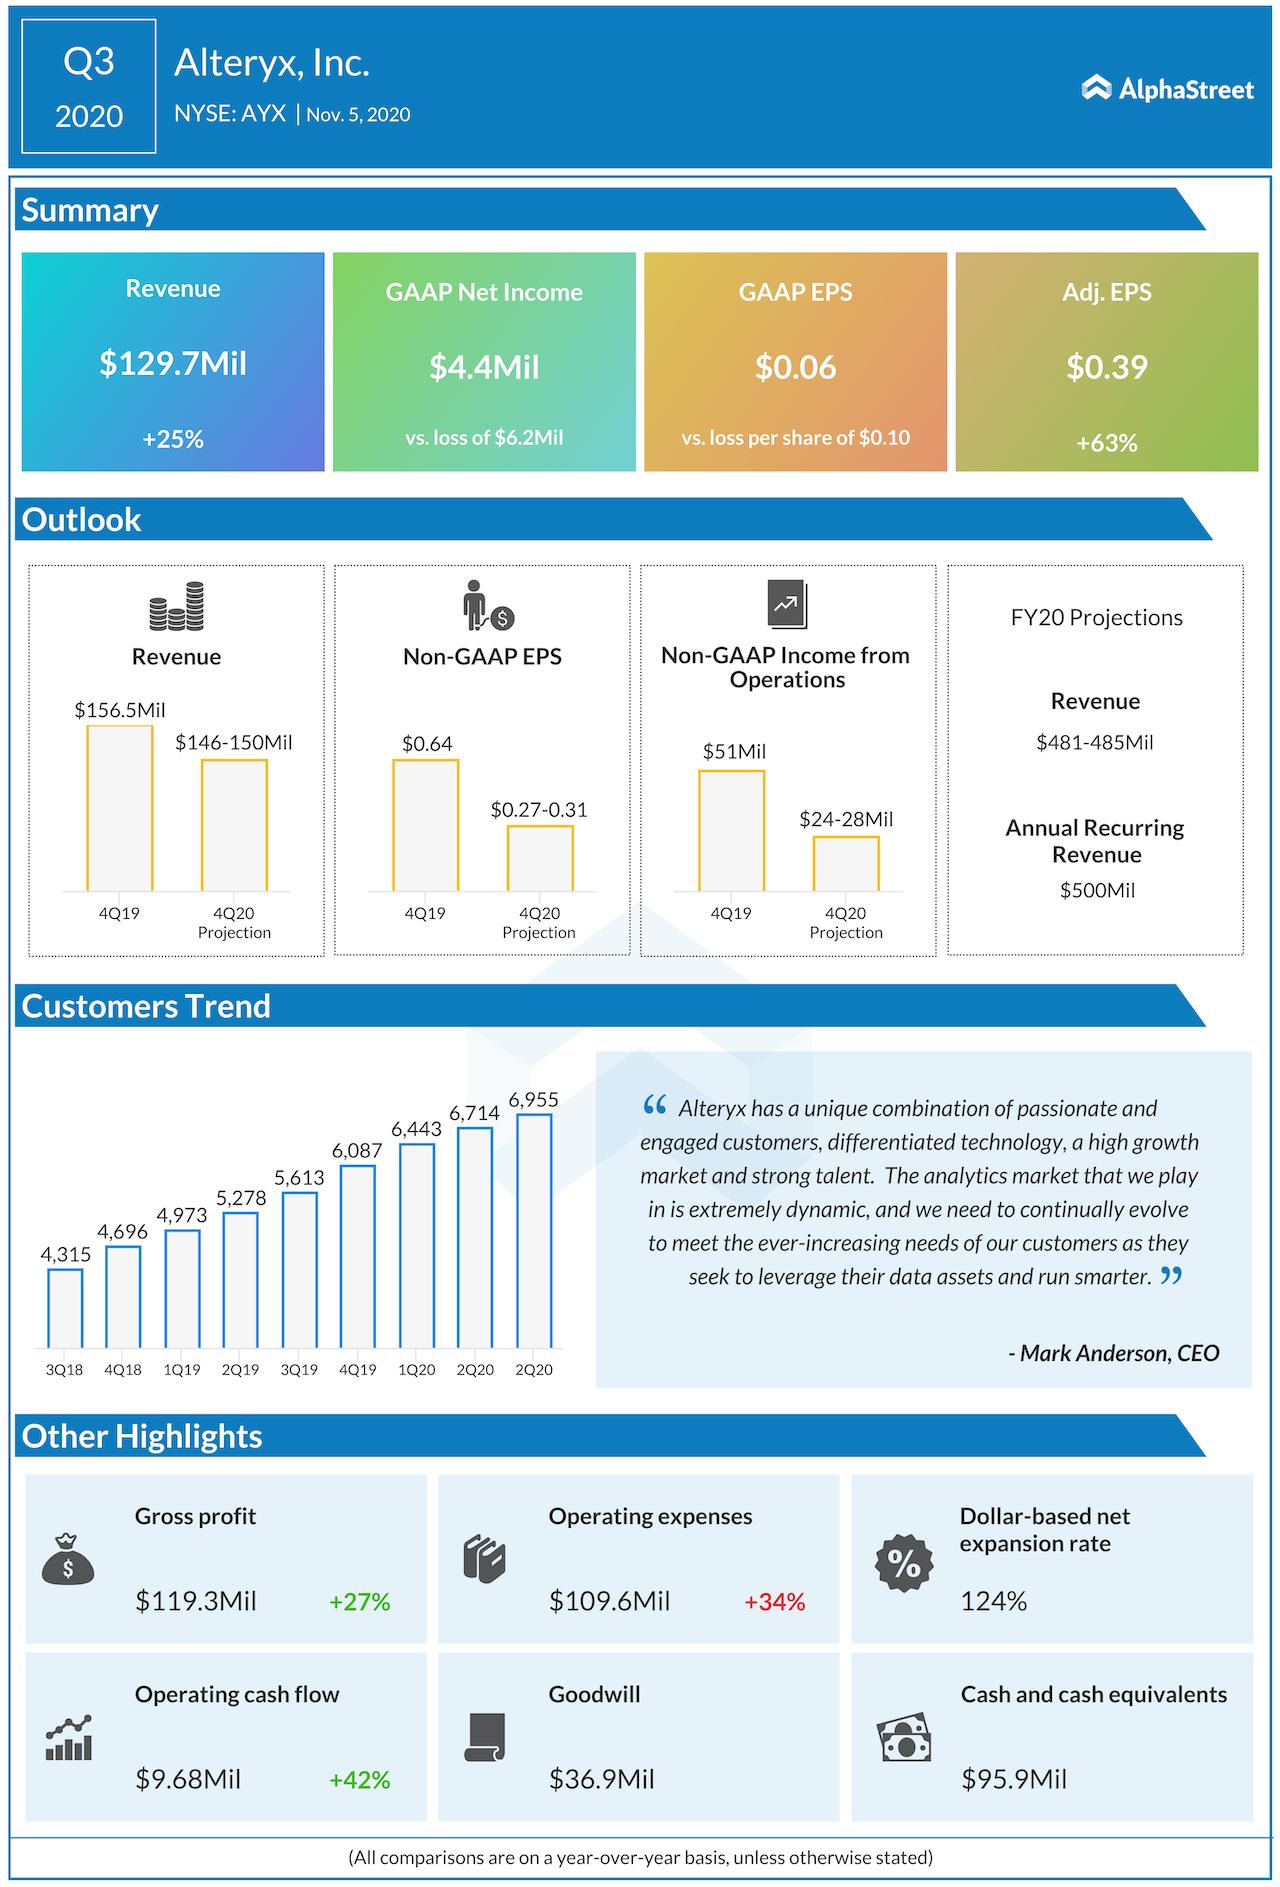 alteryx Q3 2020 earnings